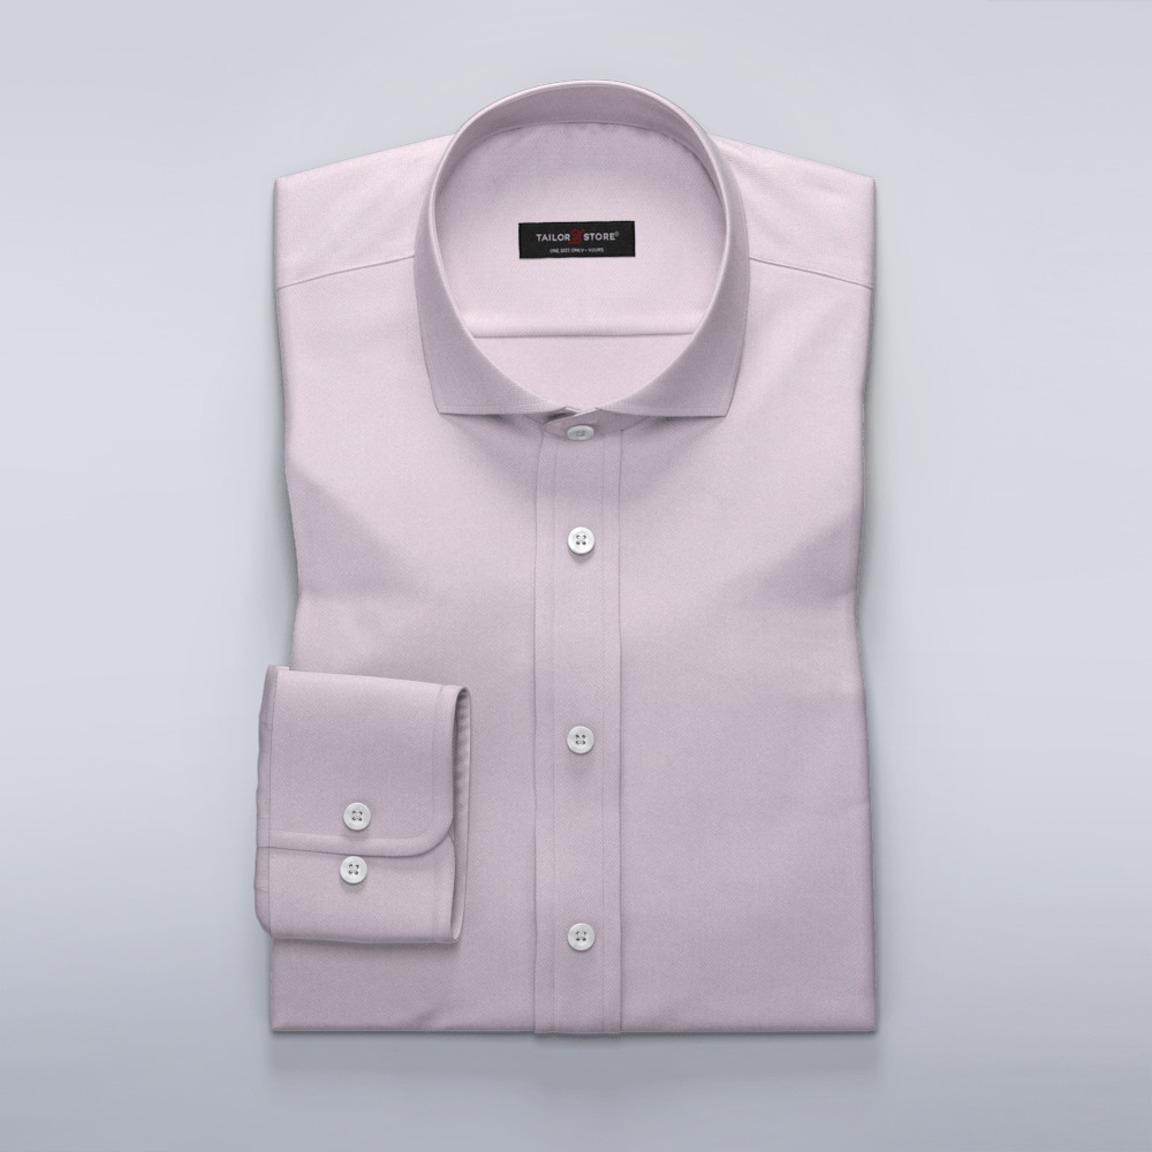 Business overhemd in luxe lichtroze herringbone